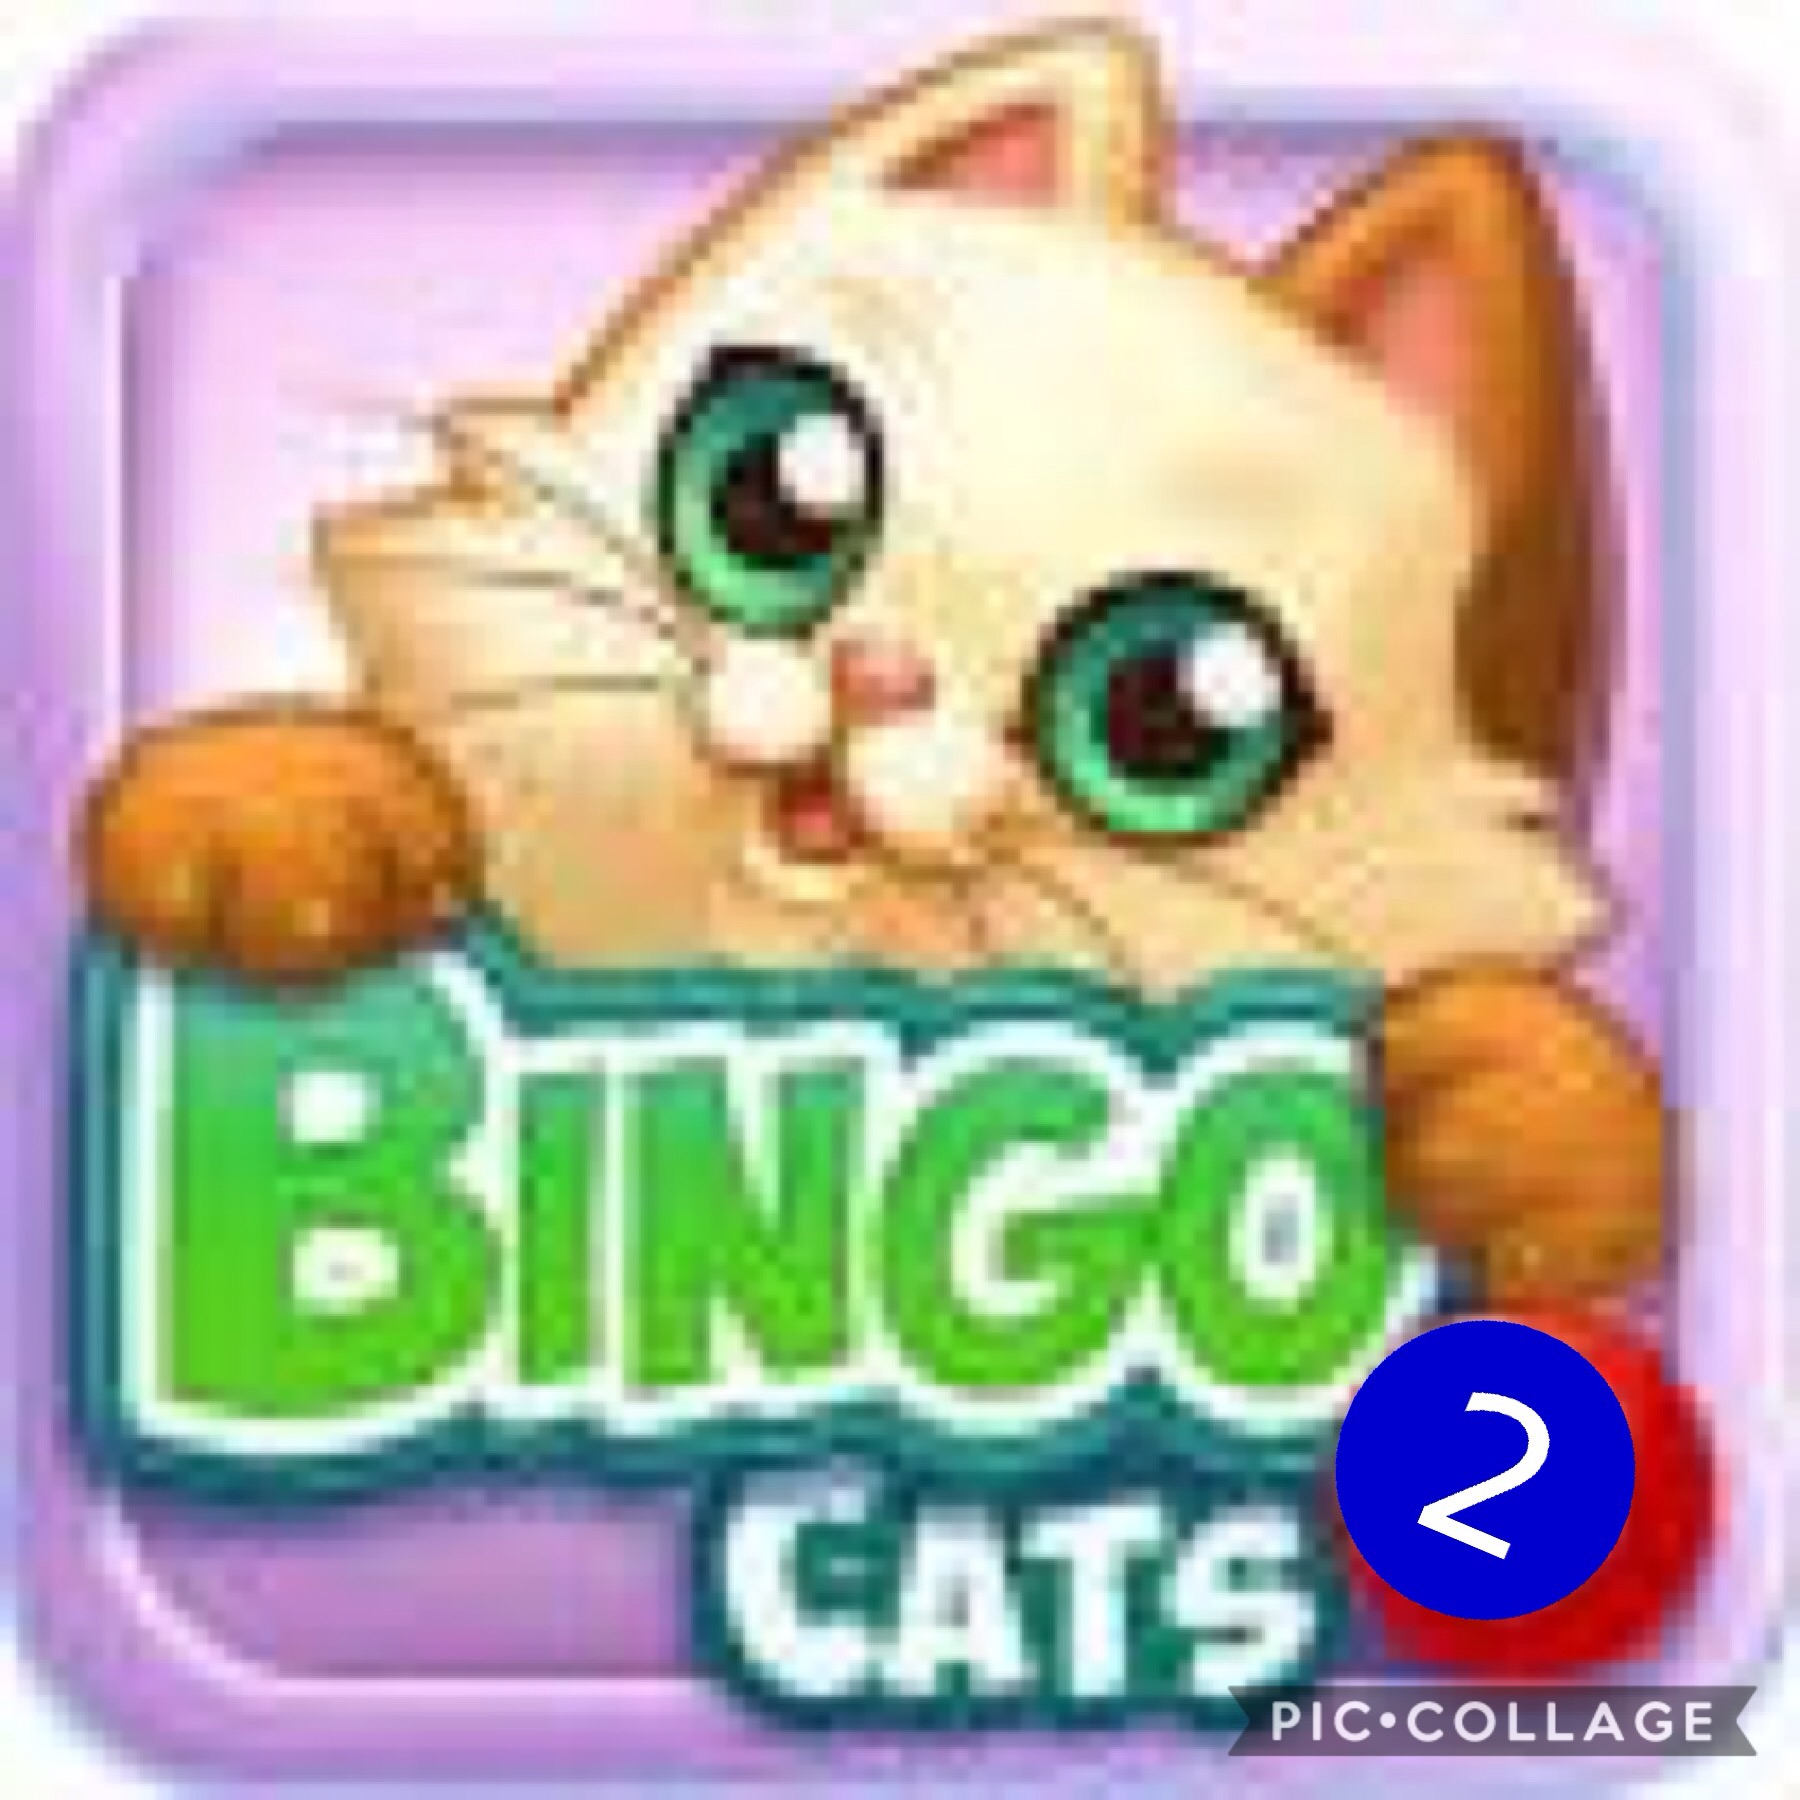 Bingo Cat 2